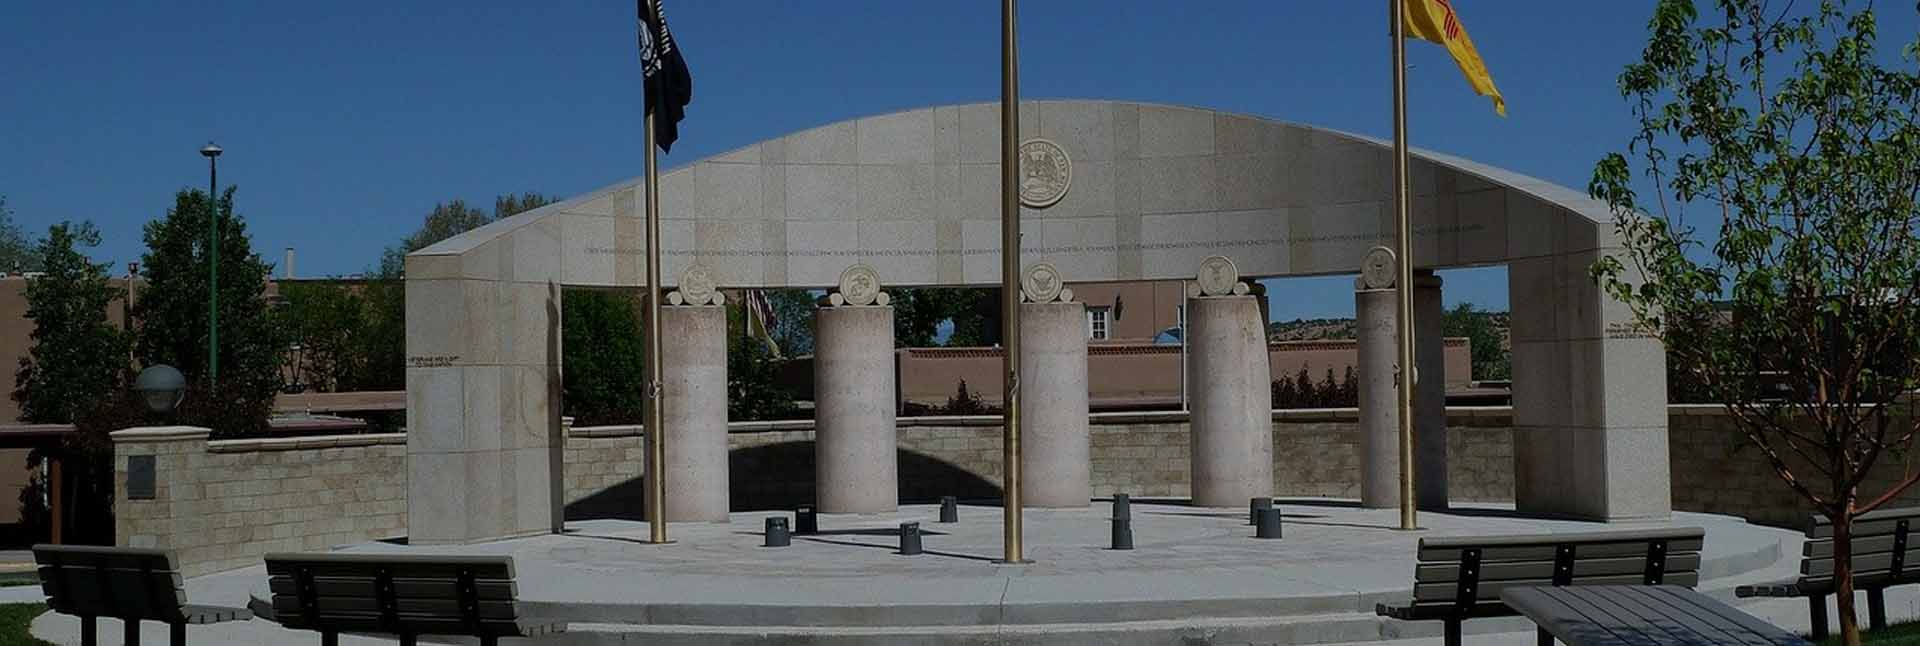 santa-fe-veterans-memorial-slide1